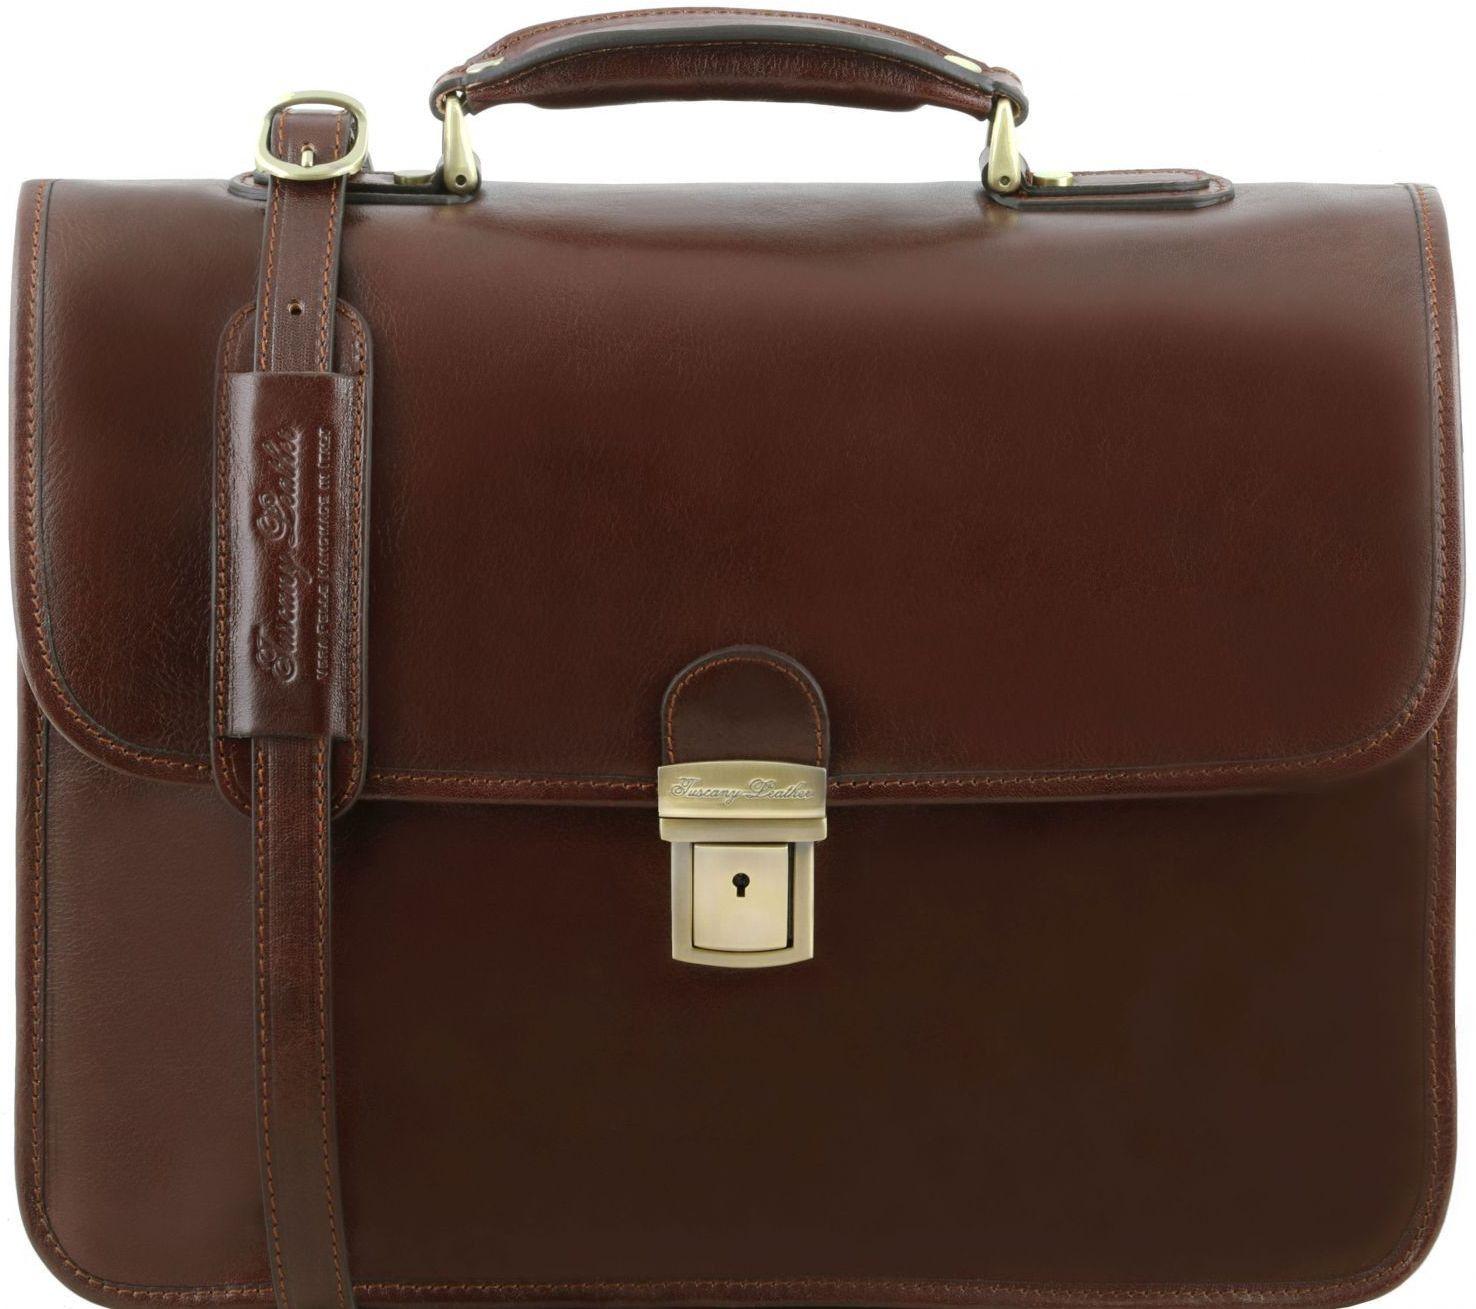 240086f687 Ανδρική Επαγγελματική Τσάντα Δερμάτινη Vernazza Καφέ Tuscany Leather